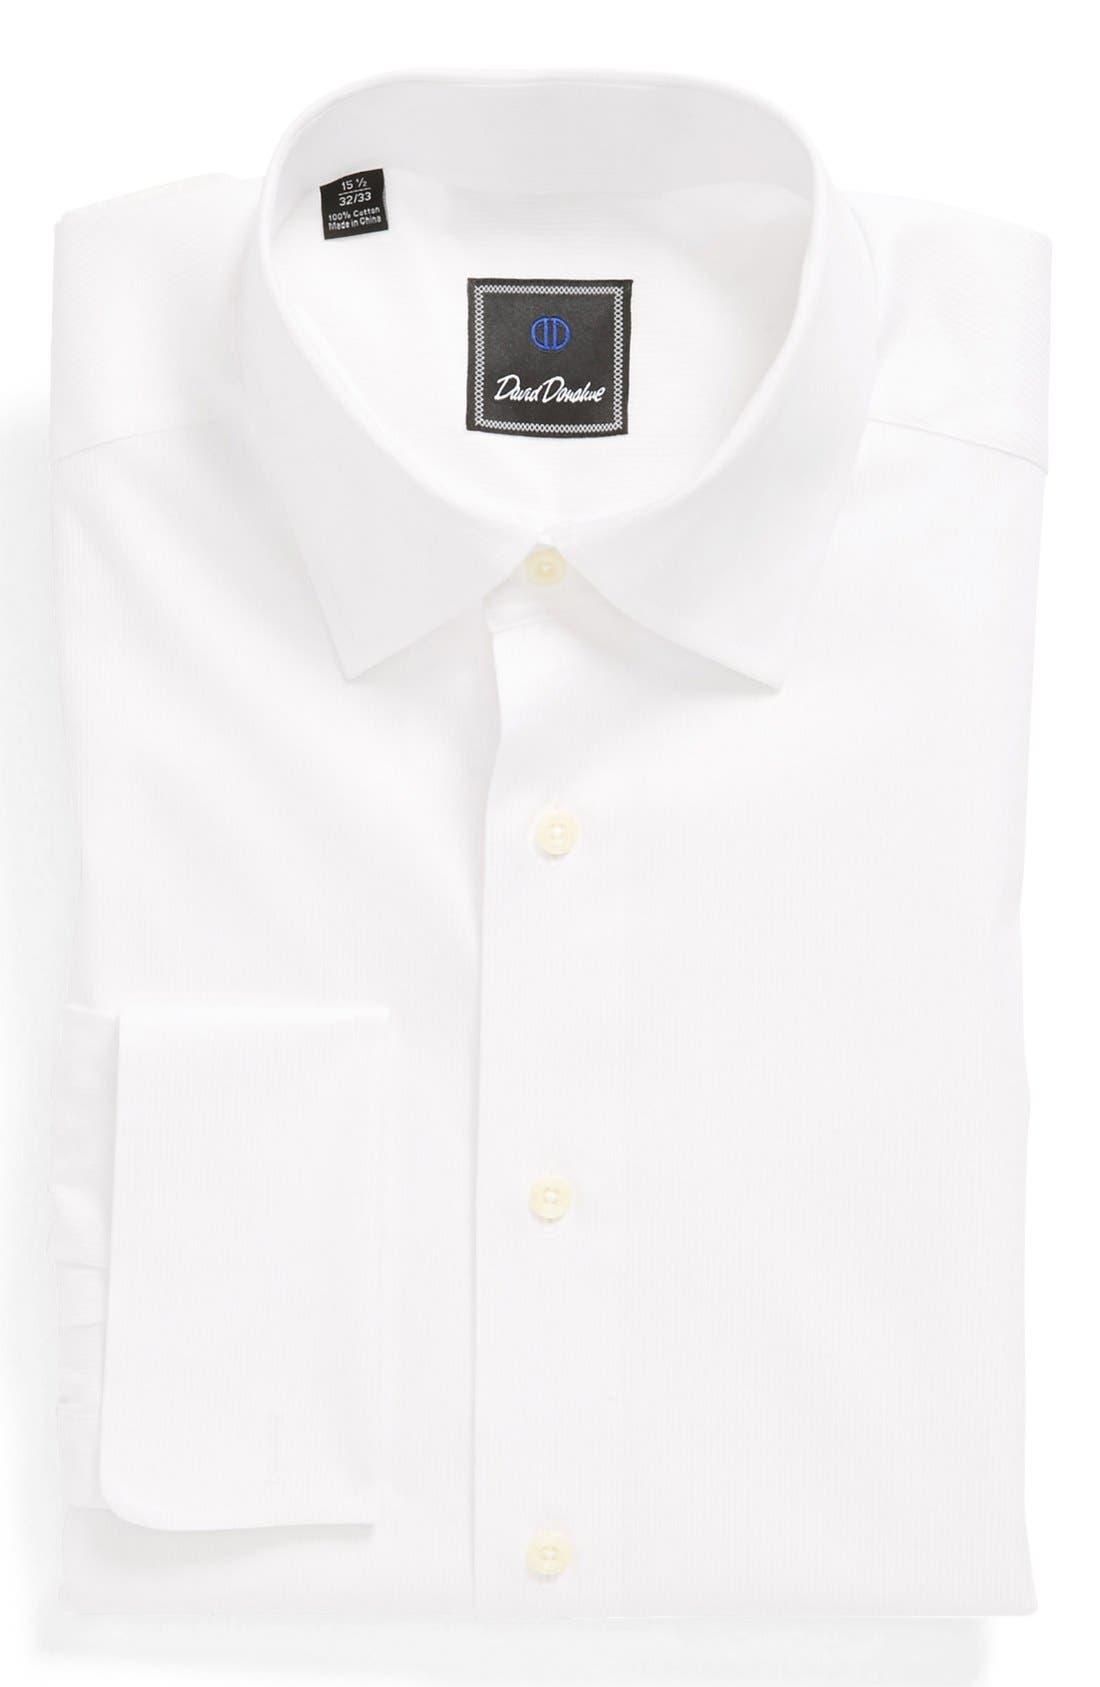 Main Image - David Donahue French Cuff Regular Fit Dress Shirt